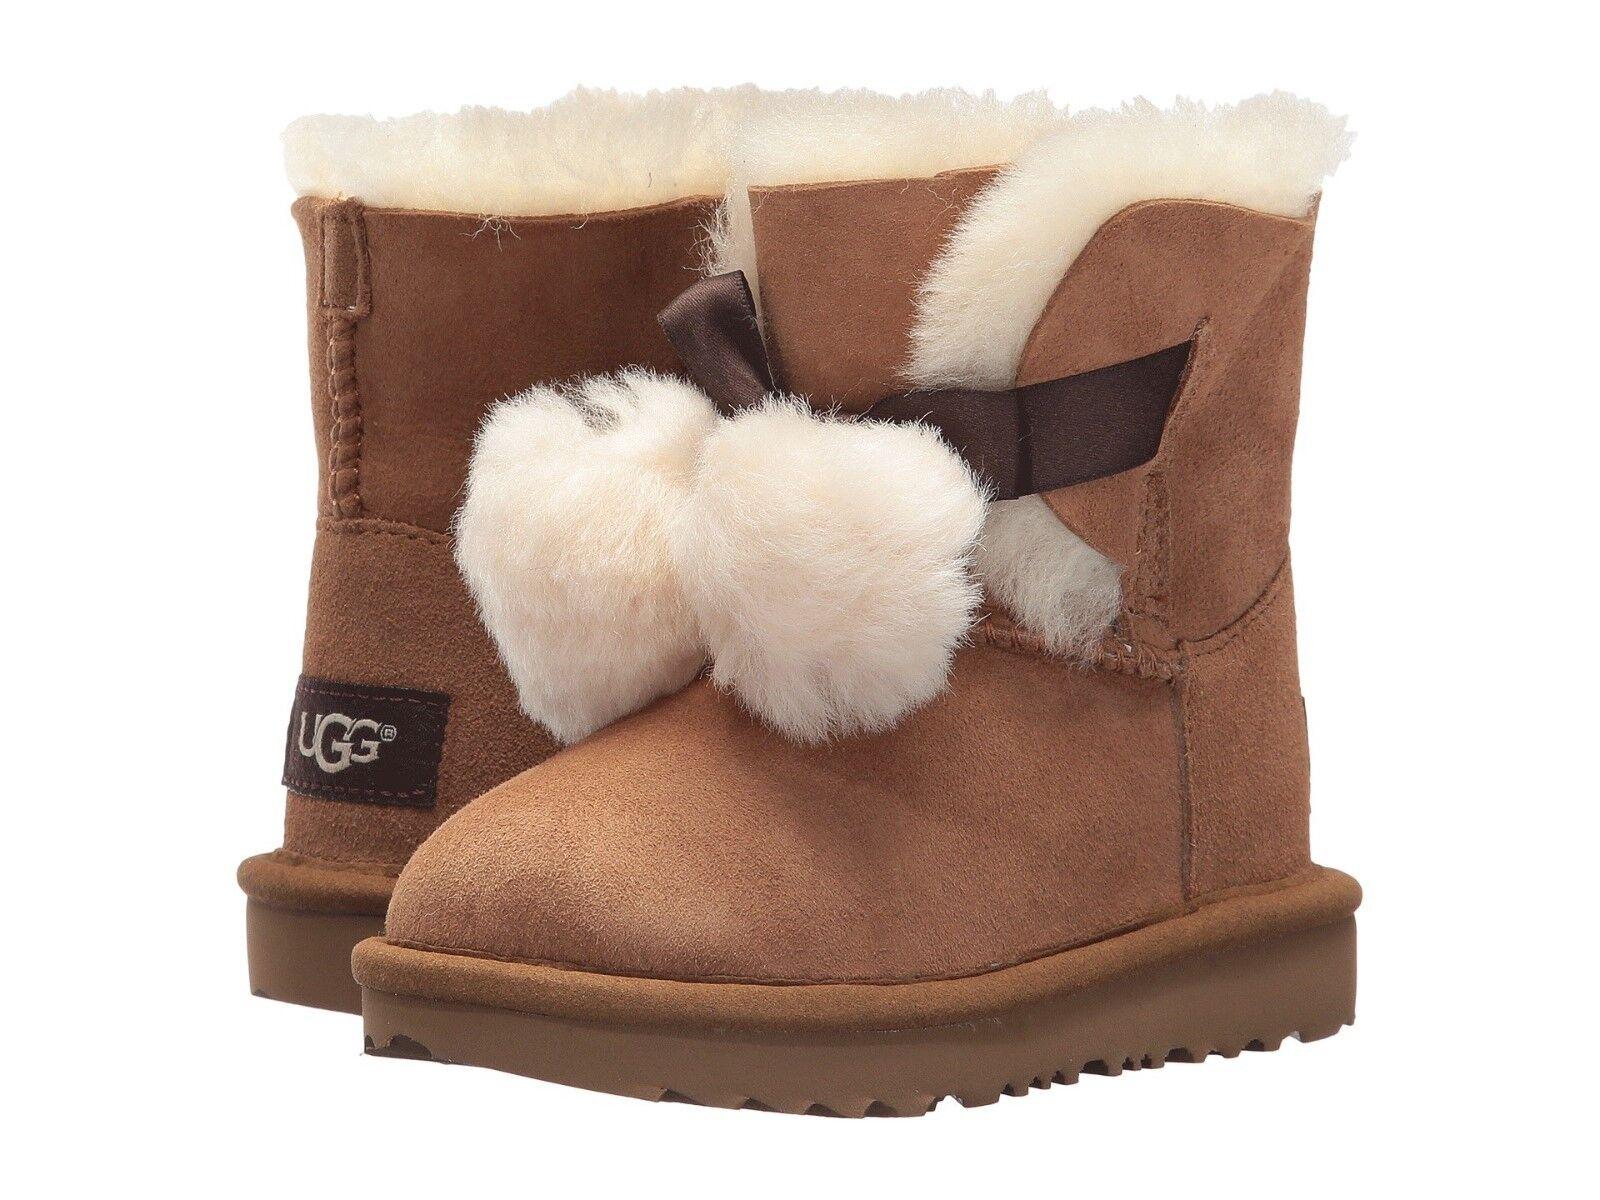 d57583182a9 UGG Kids Toddler Gita Classic Novelty Boot 1017403t Chestnut Size 10